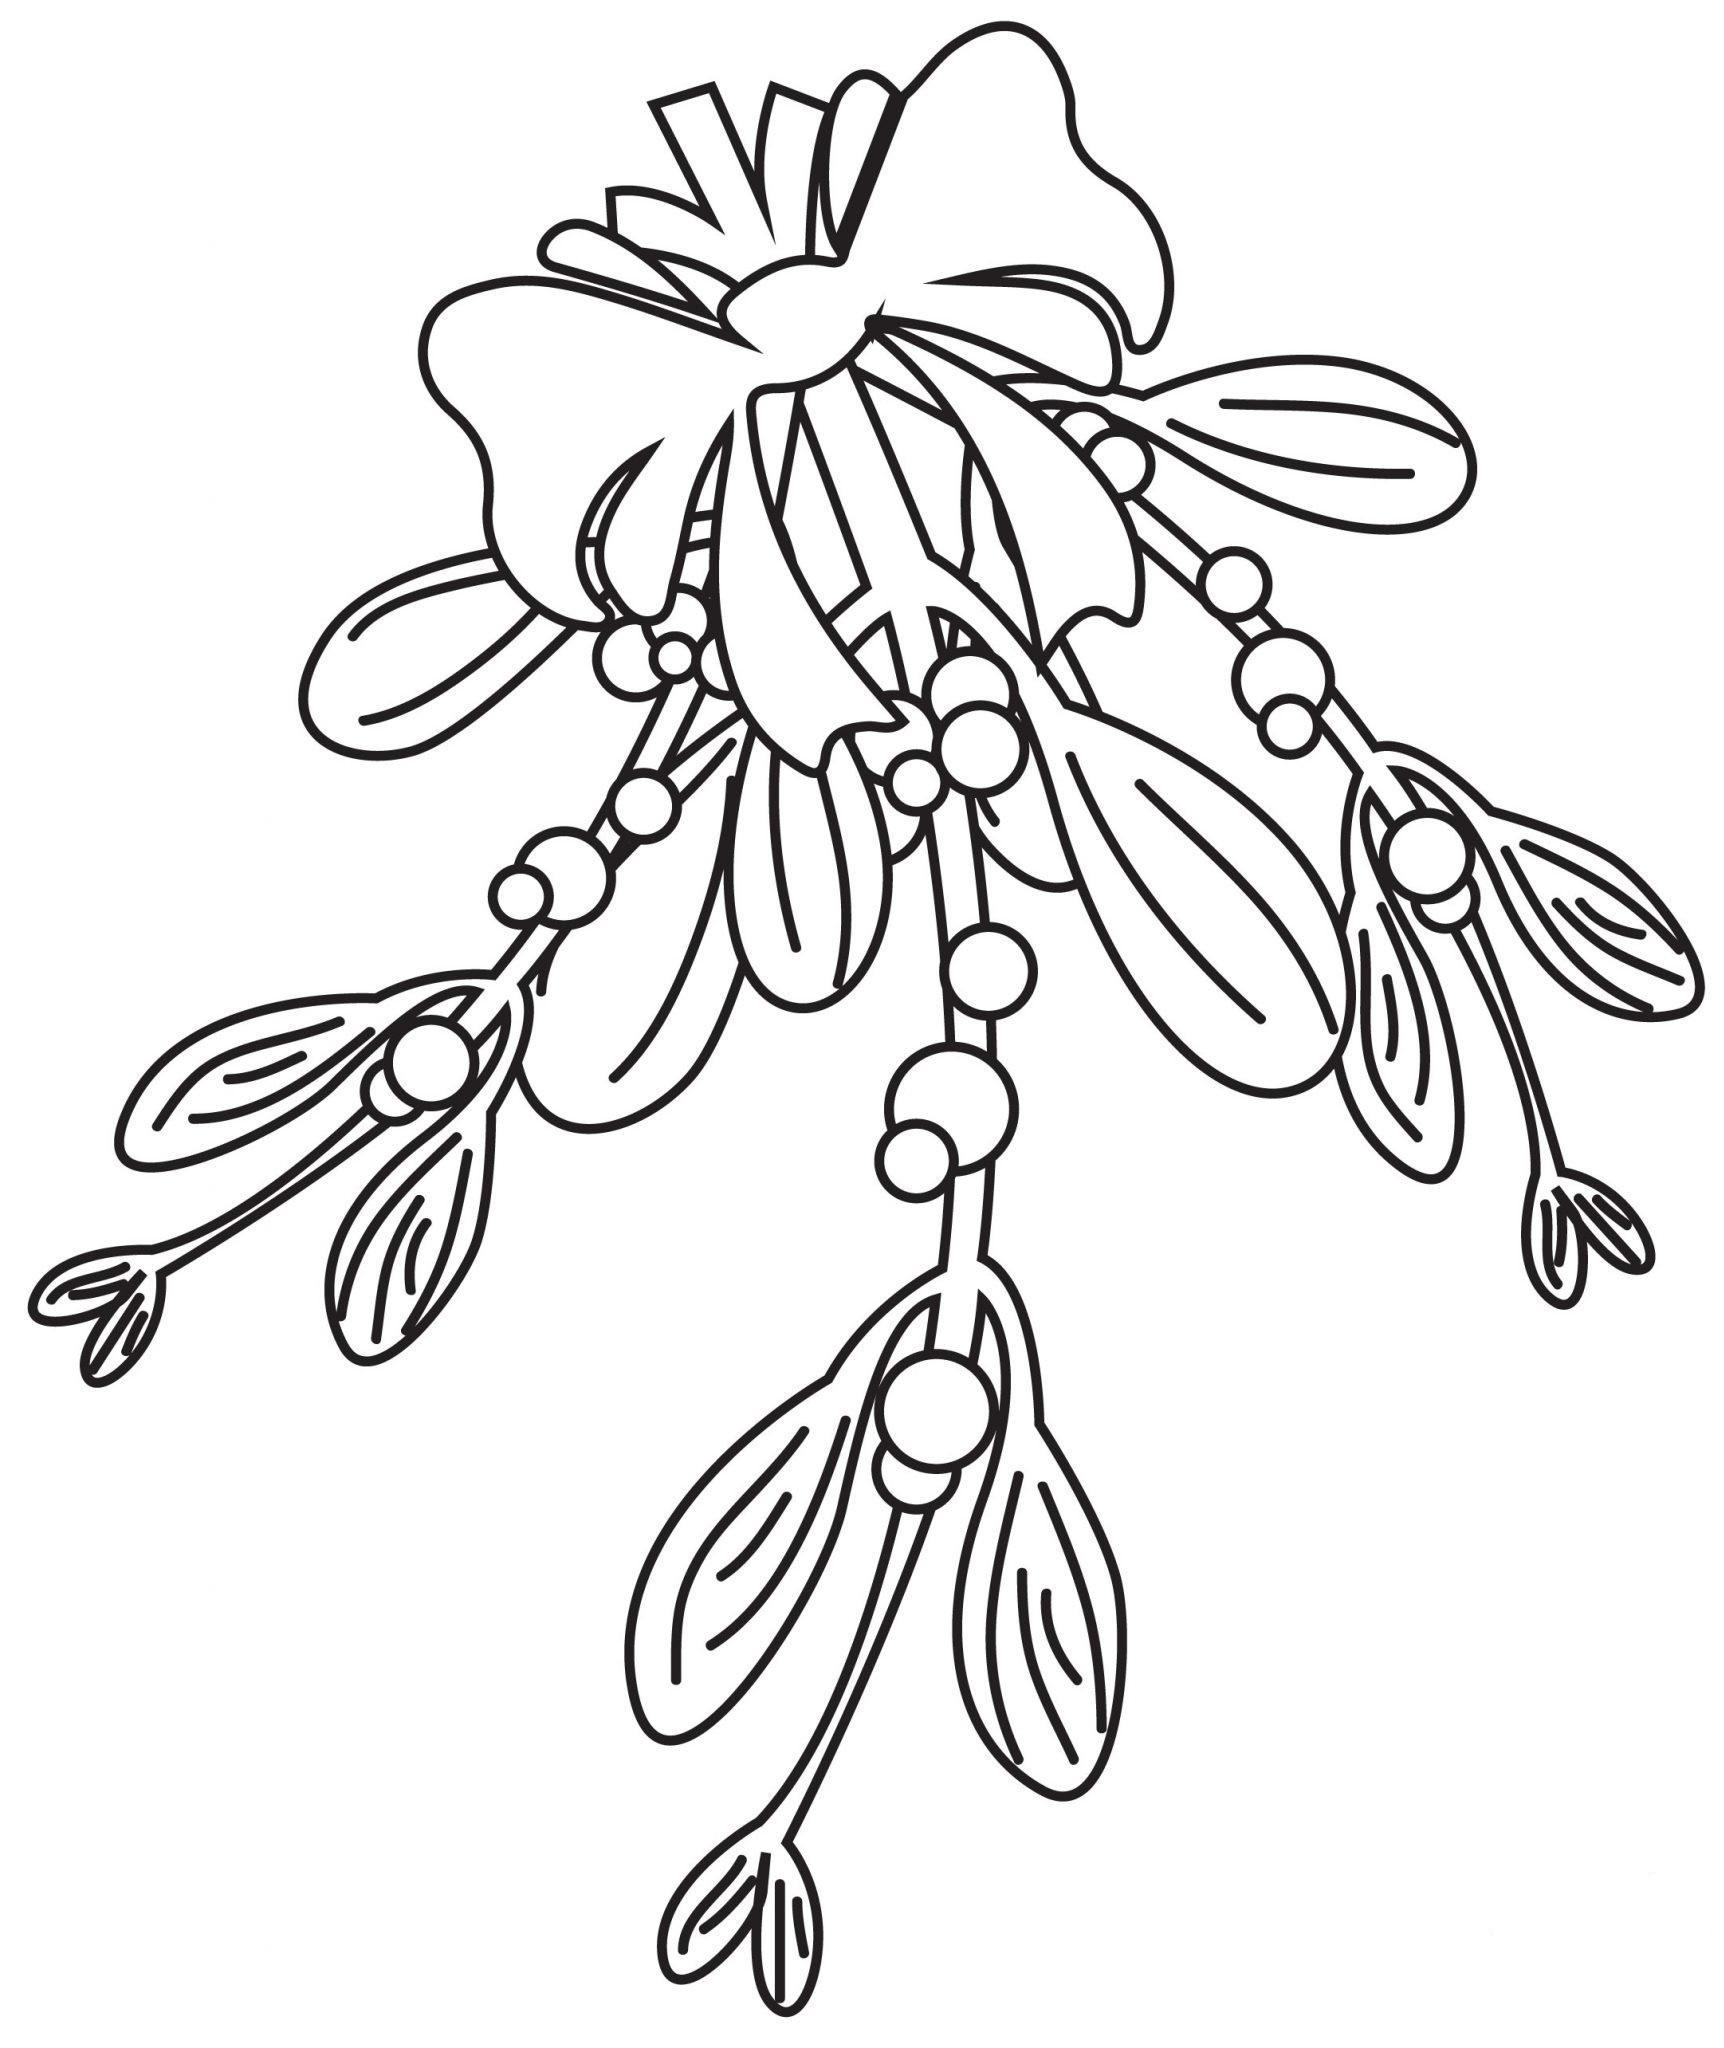 Mistletoe Coloring Pages